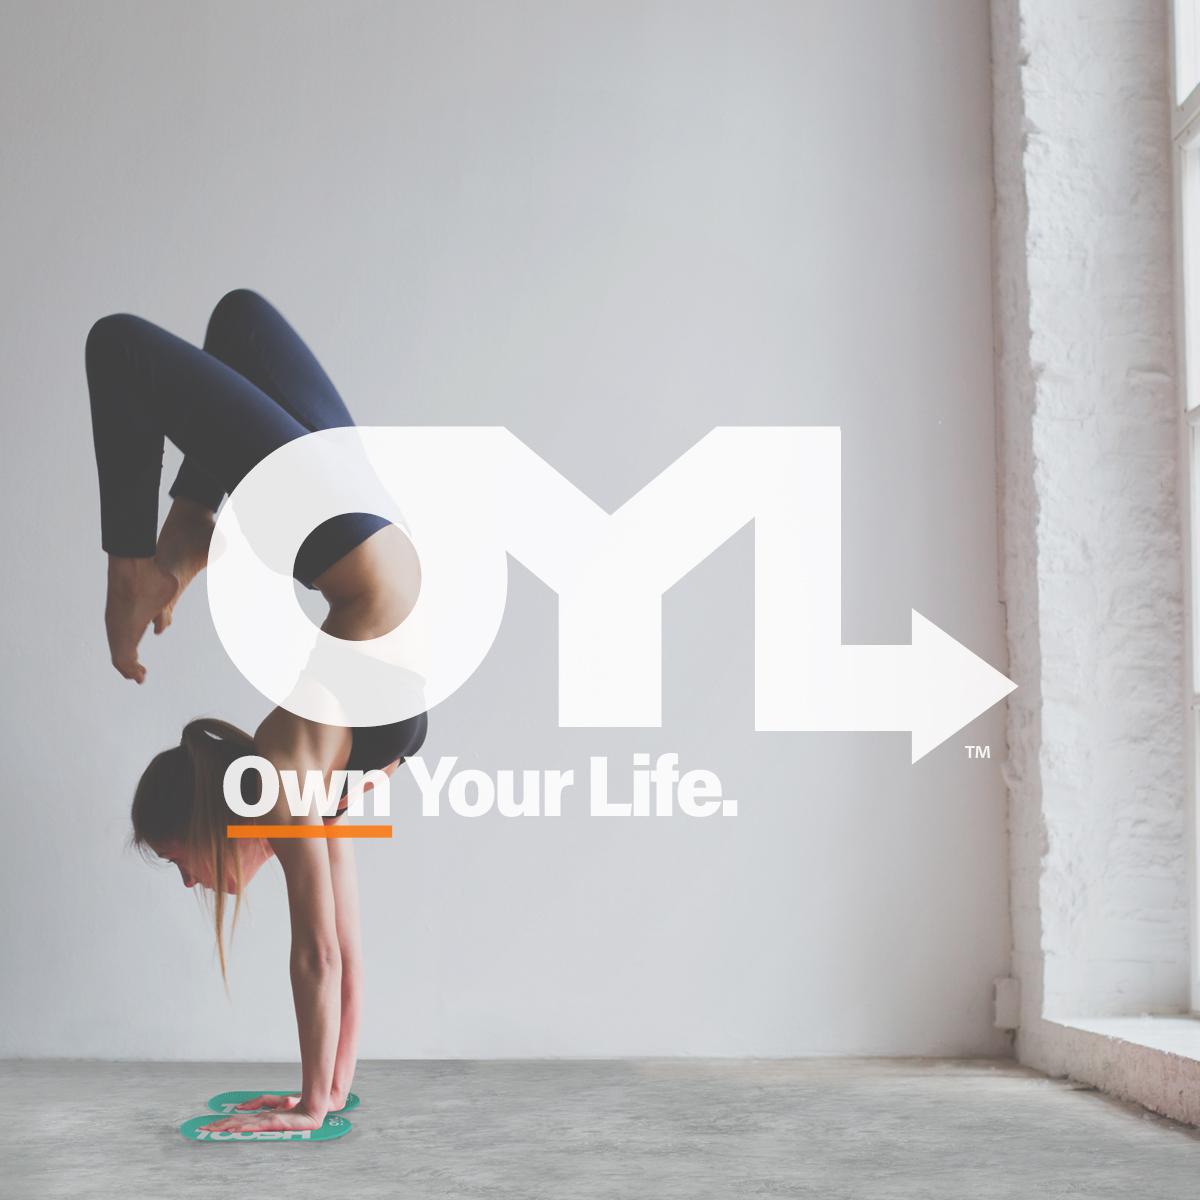 OYL-Branding-Concept-1b.jpg